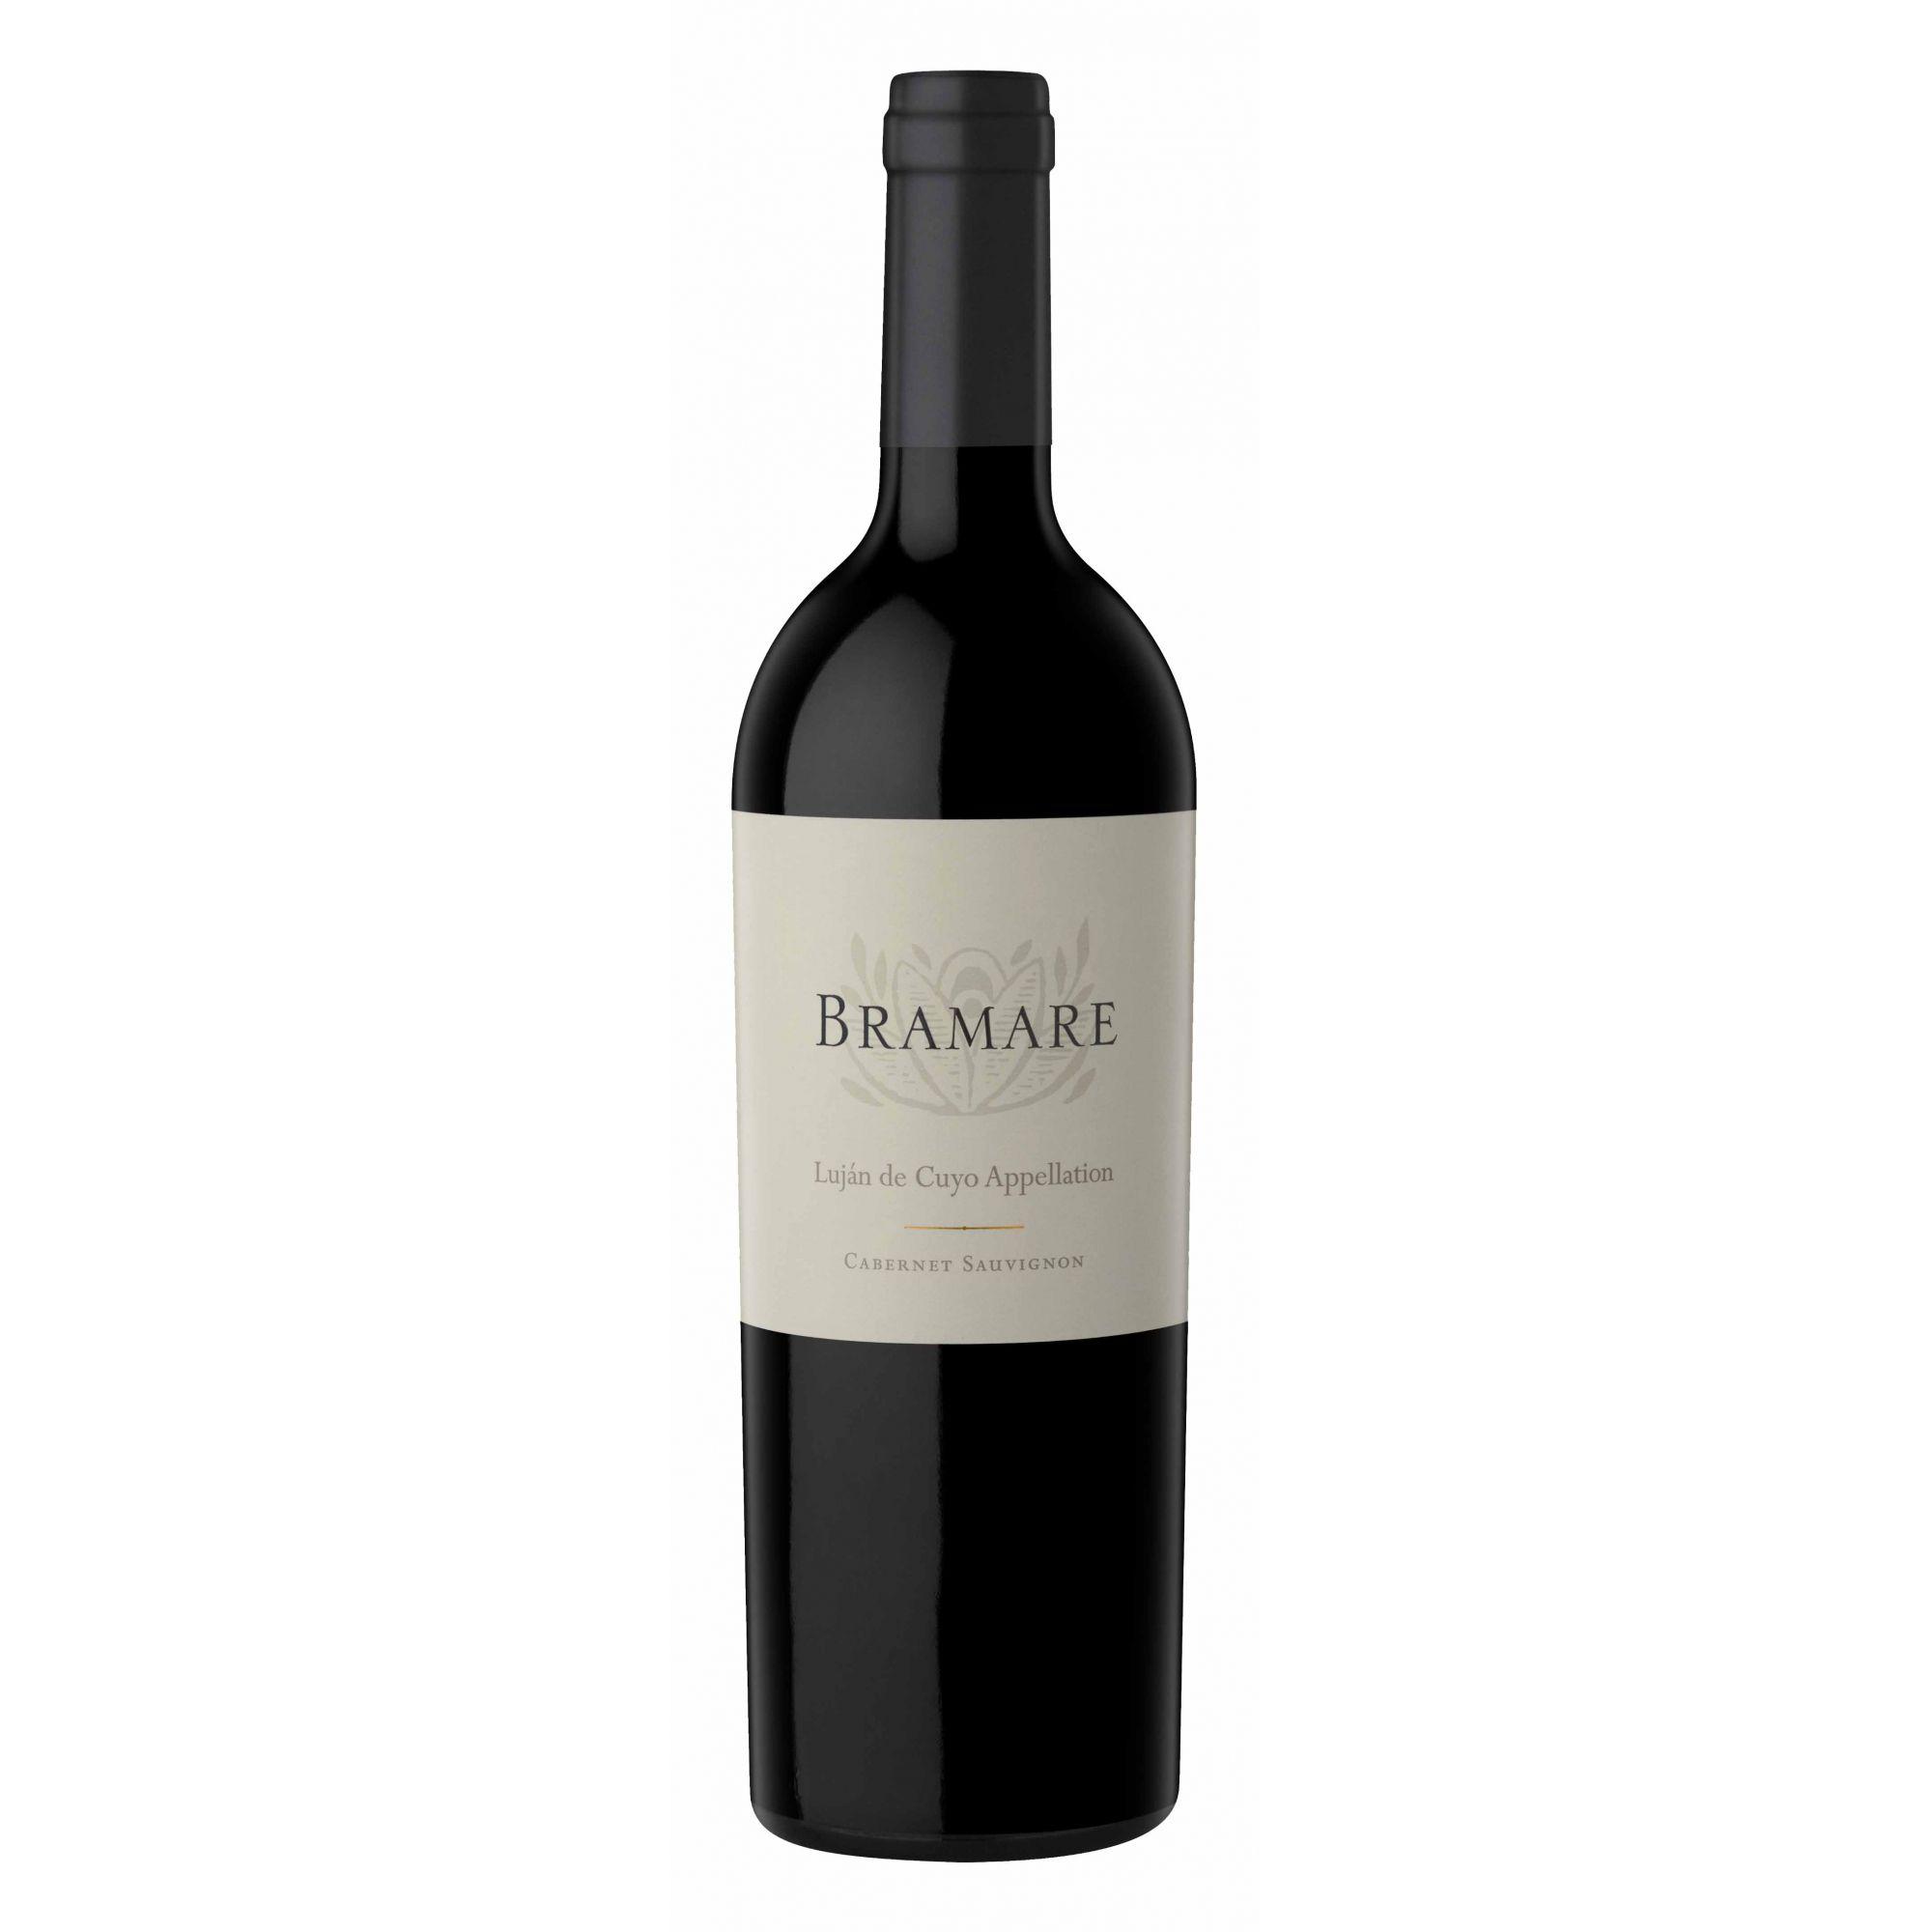 Vinho Tinto Bramare Cabernet Sauvignon 2017 1,5L